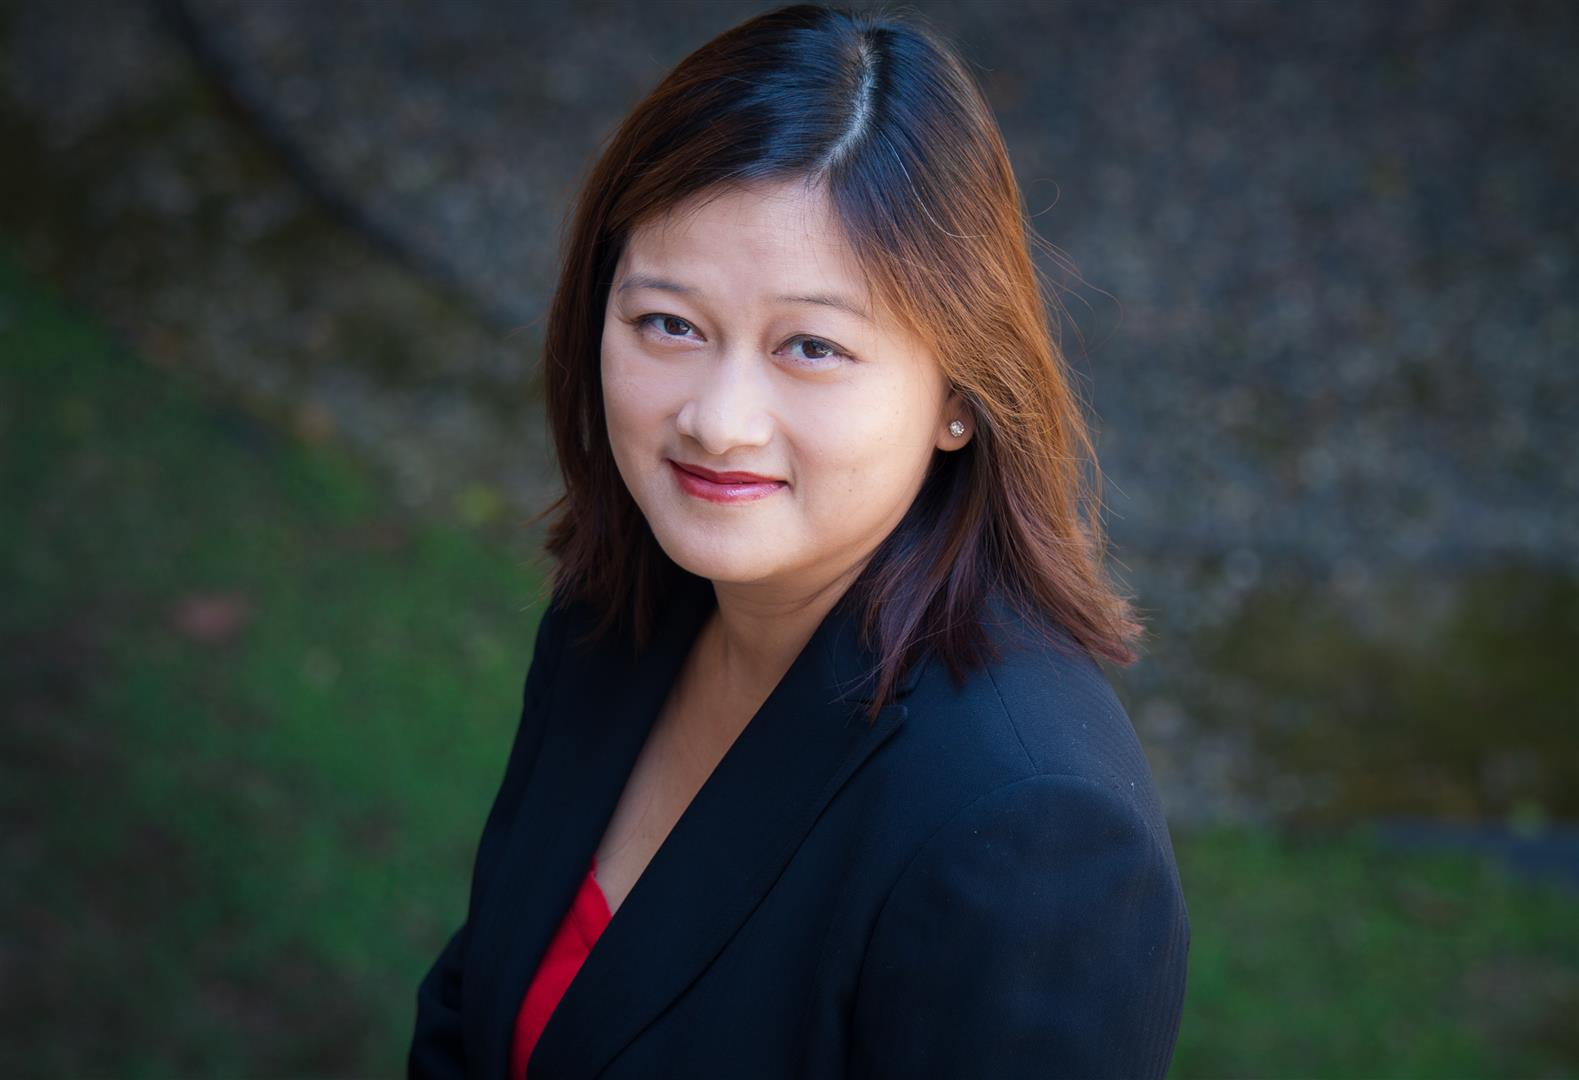 Hienhoa undefined Nguyen